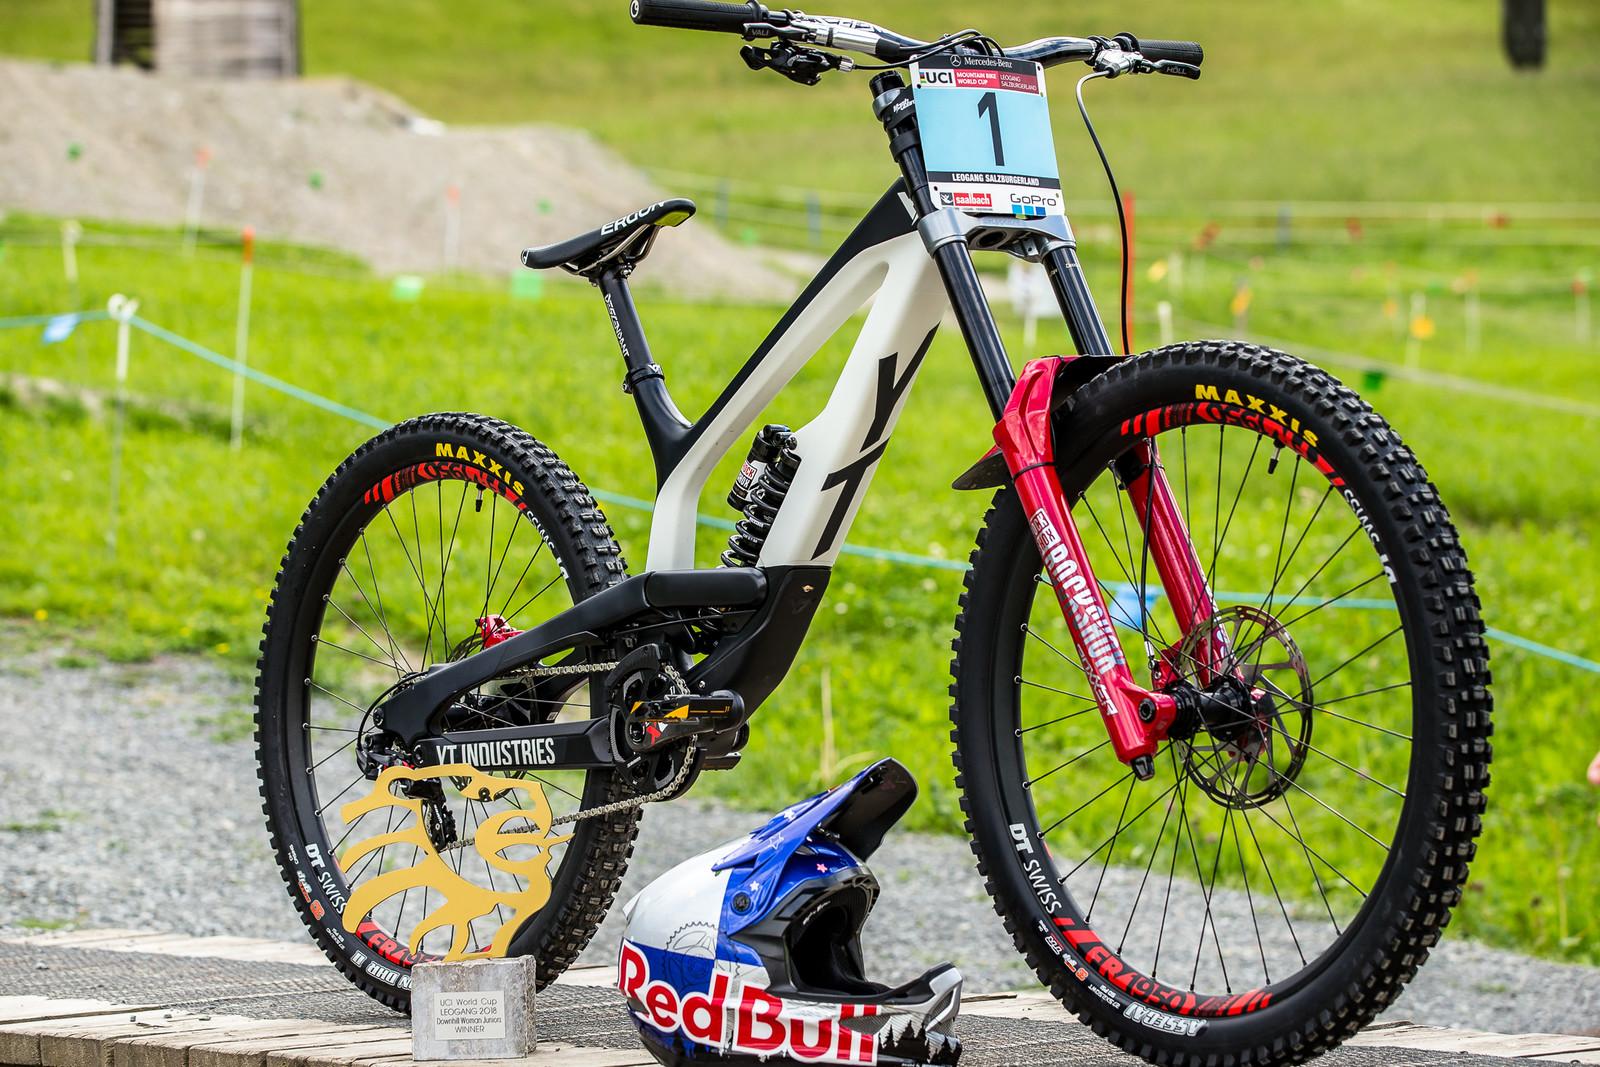 One Dialed Bike - WINNING BIKE - Vali Höll's YT TUES - Mountain Biking Pictures - Vital MTB